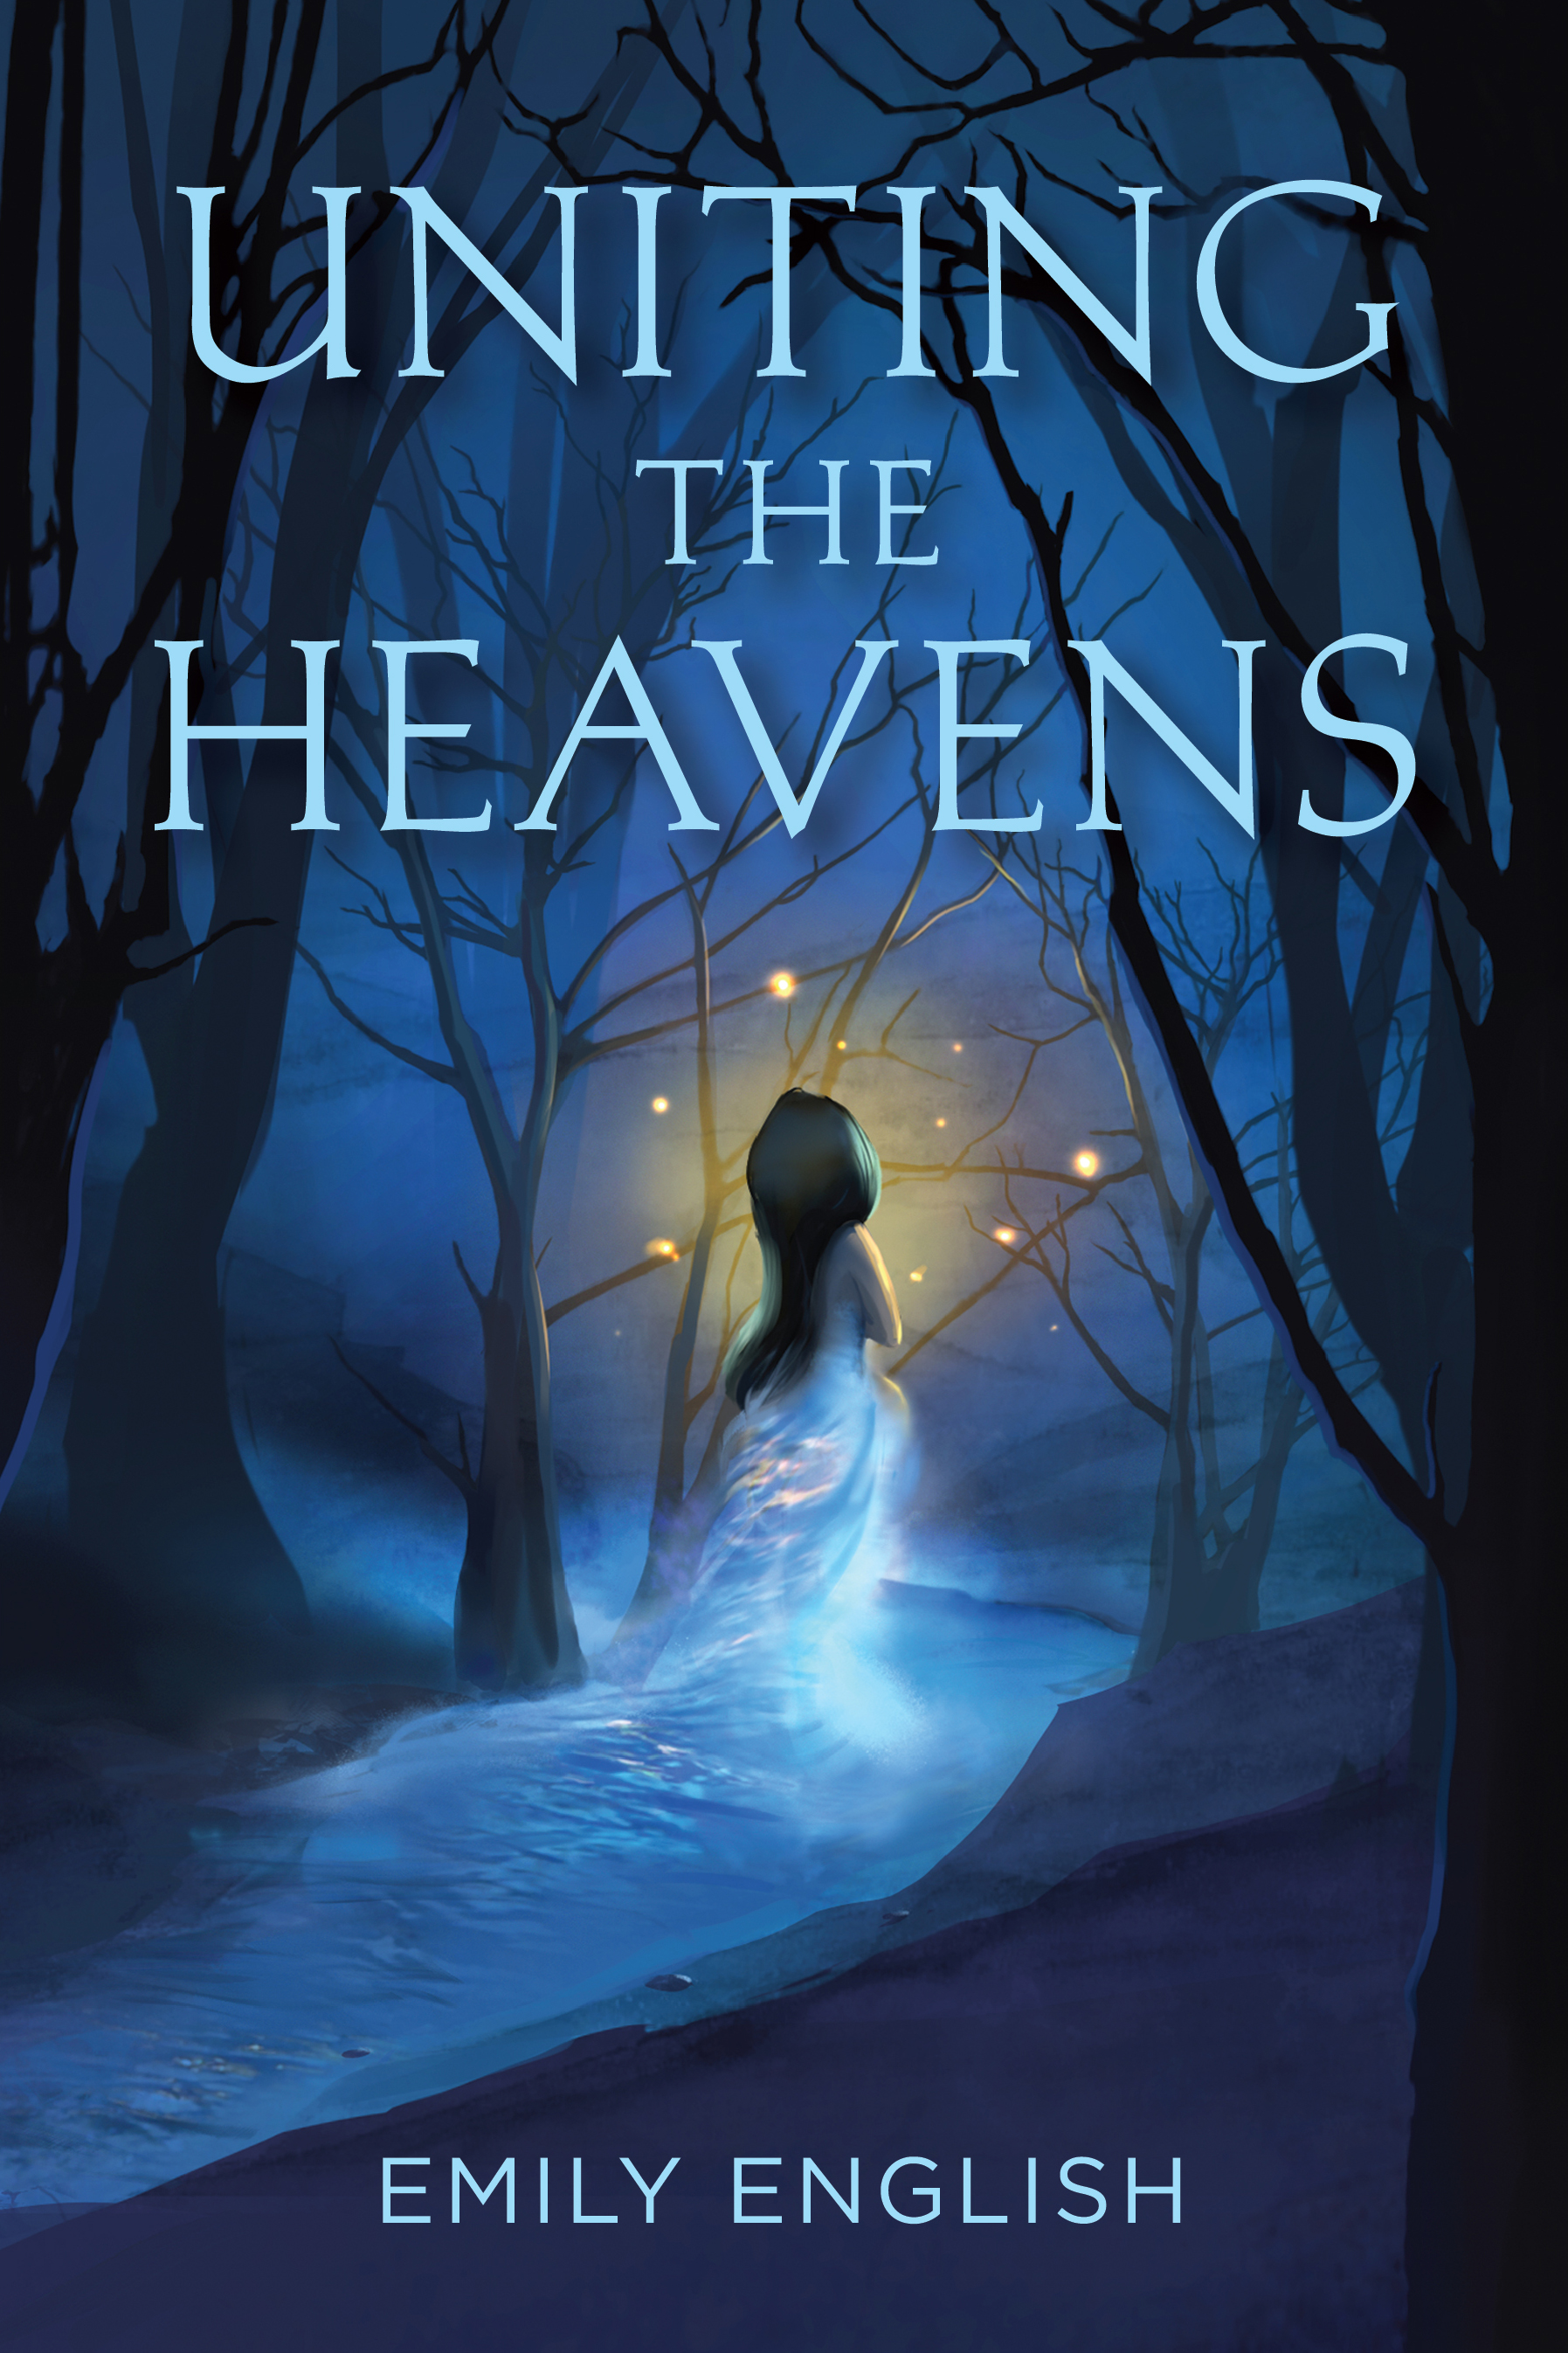 Uniting the Heavens Fantasy Book Cover.jpg